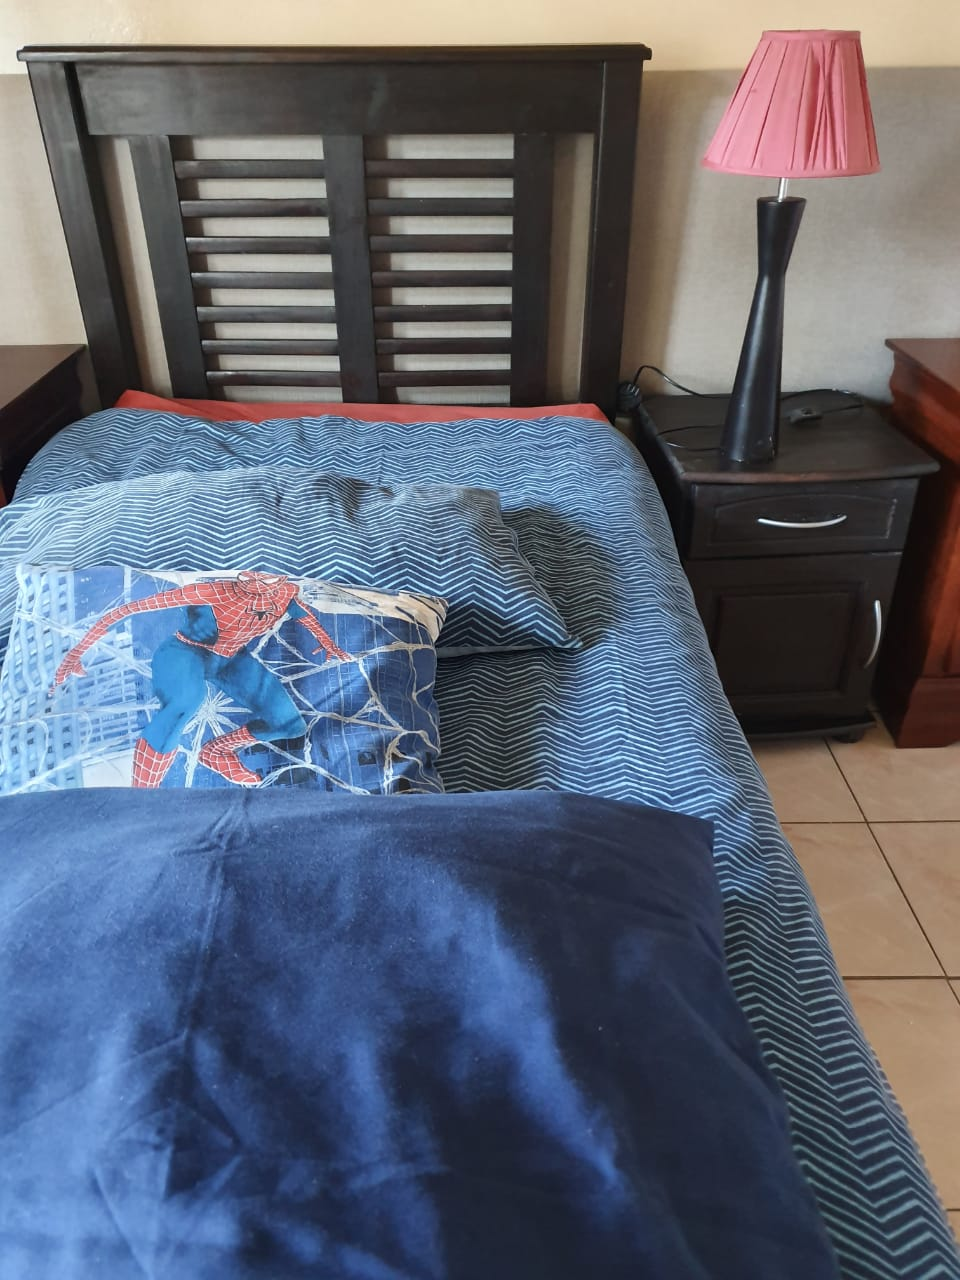 Bed,bed lamp,mattress